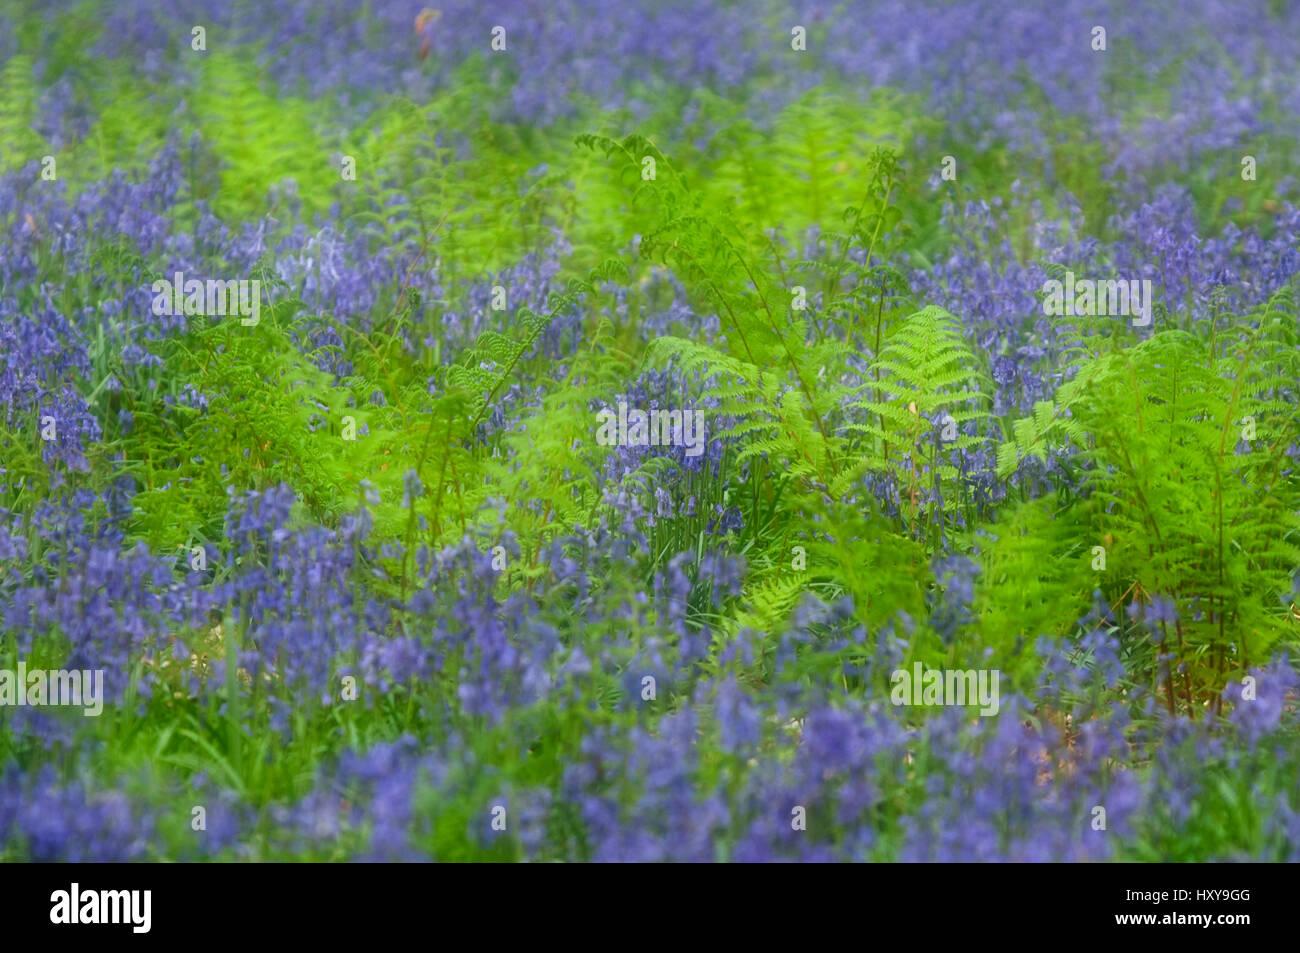 Bluebells (Hyacinthoides non-scripta / Endymion scriptum) flowering in Broad buckler fern (Dryopteris dilatata), - Stock Image